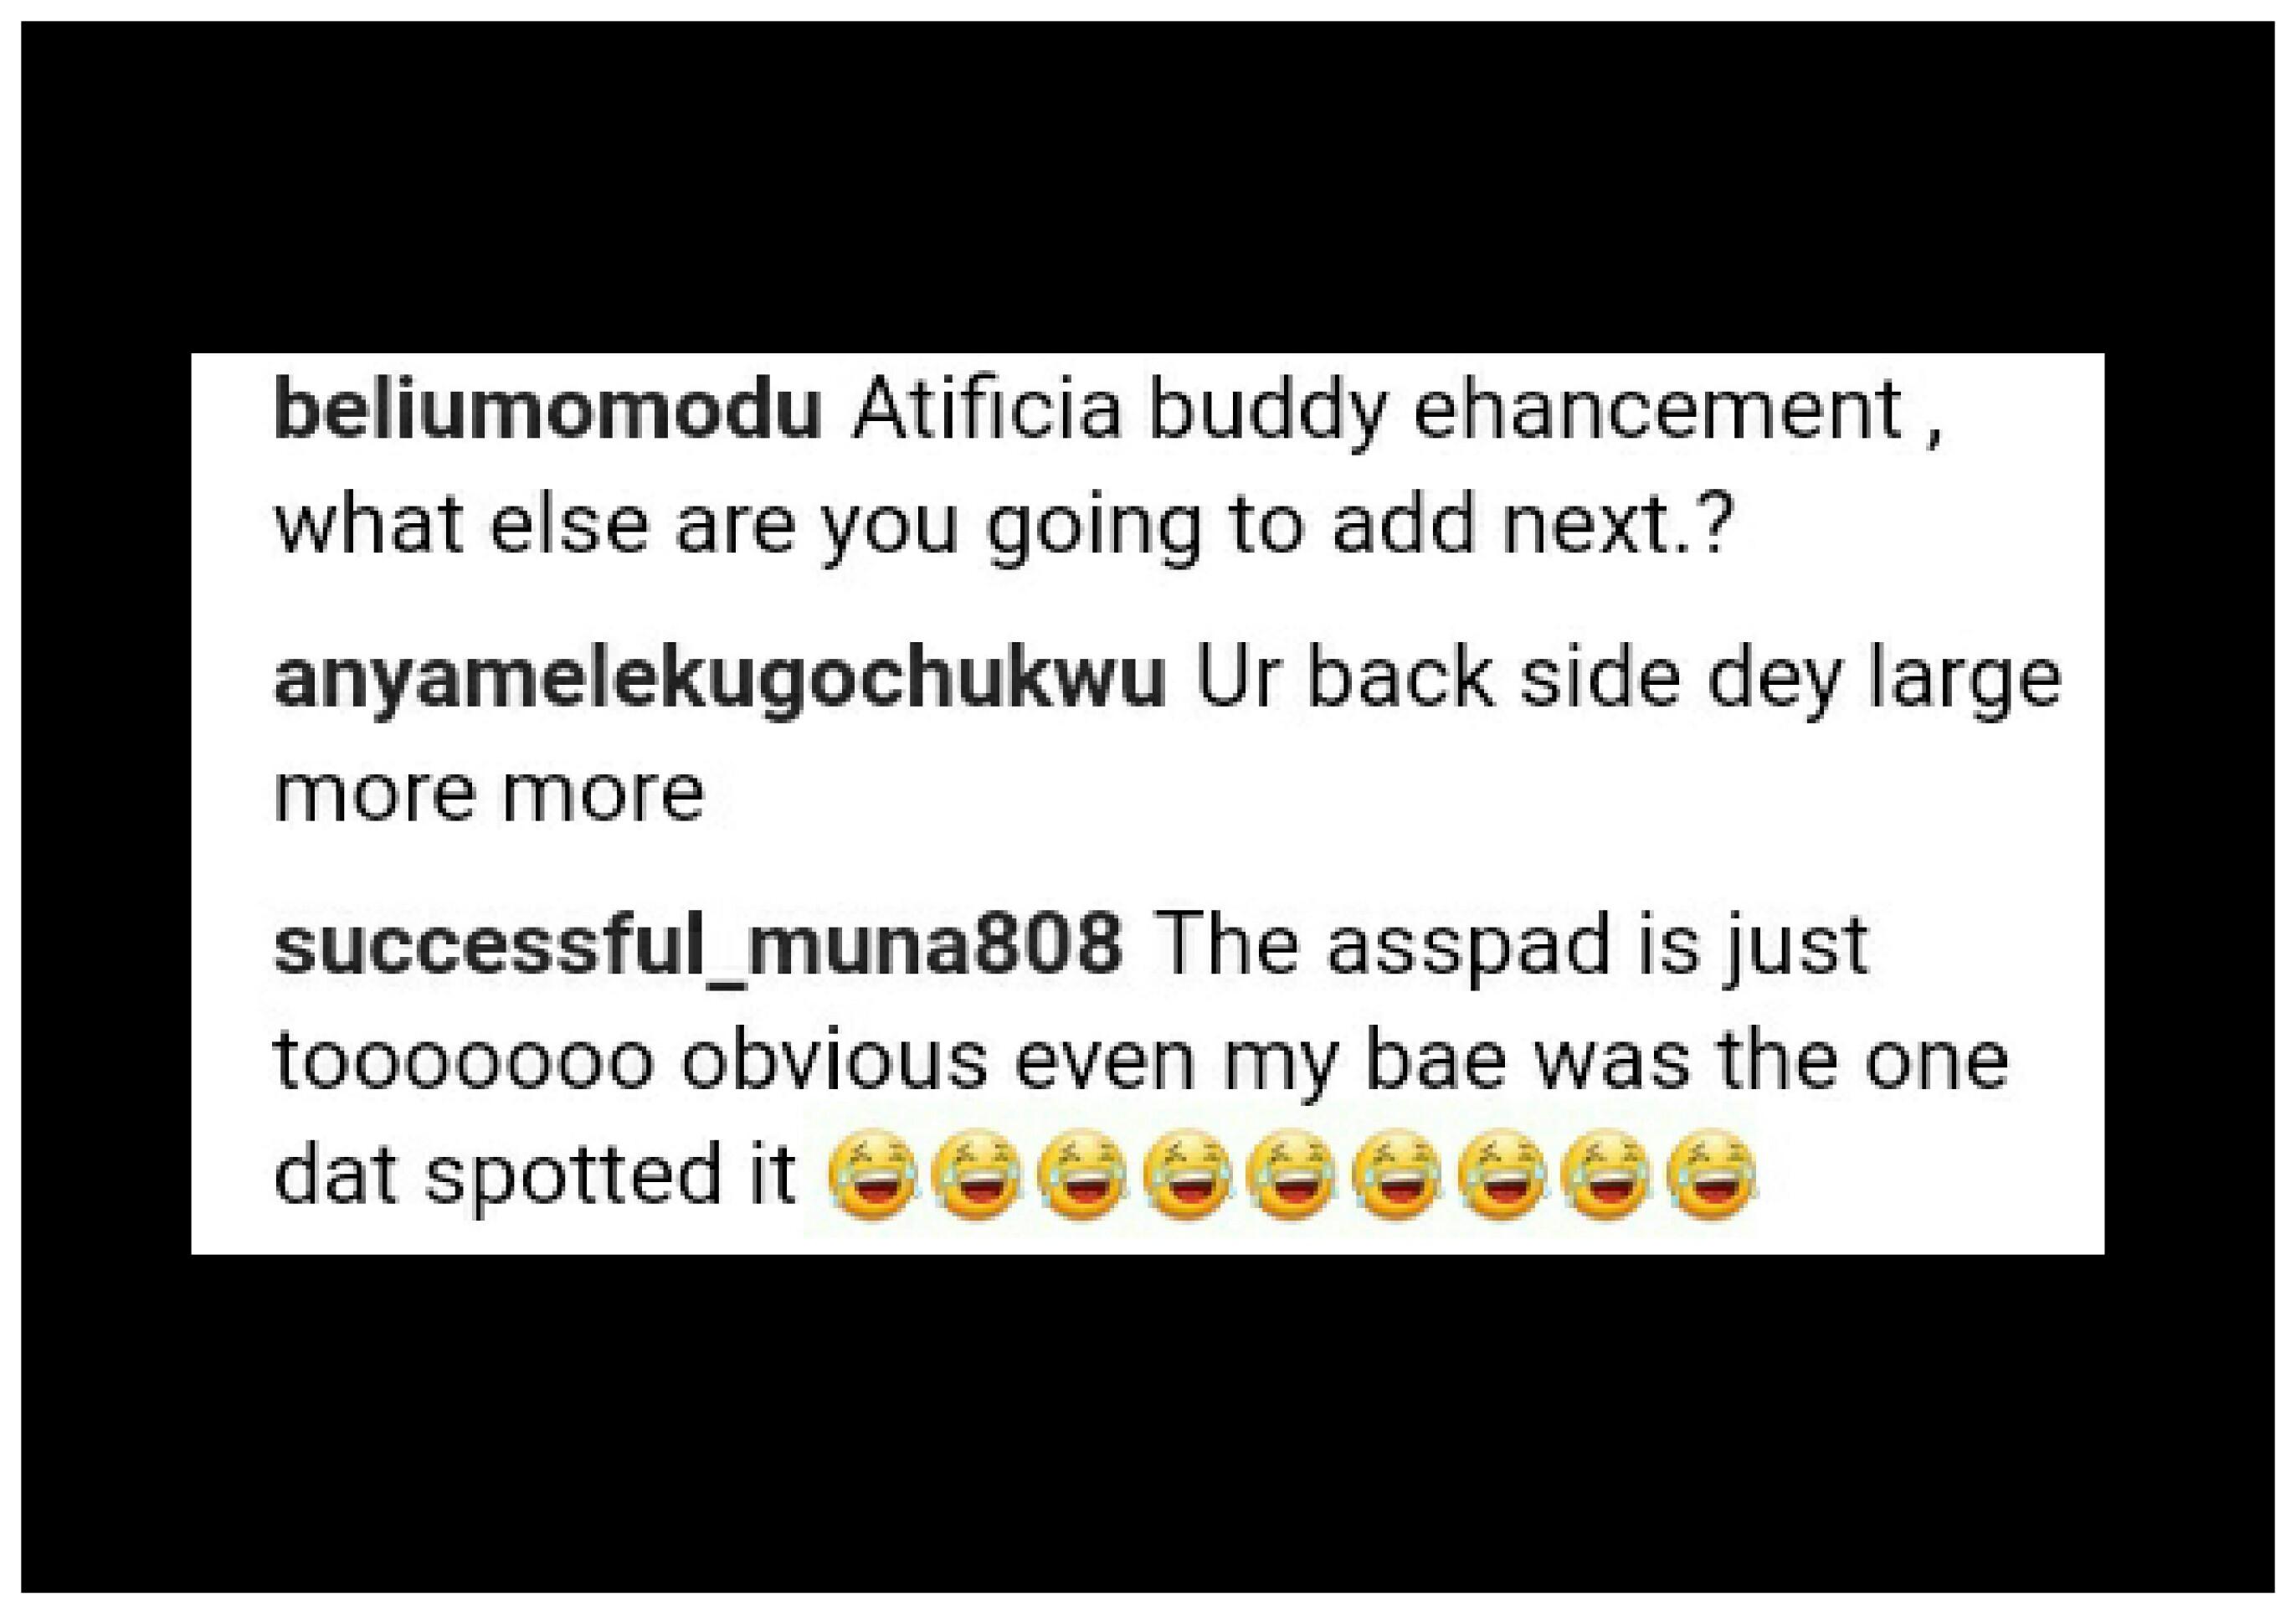 Oge Okoye Has Been Accused Of Wearing Butt Pad (4)